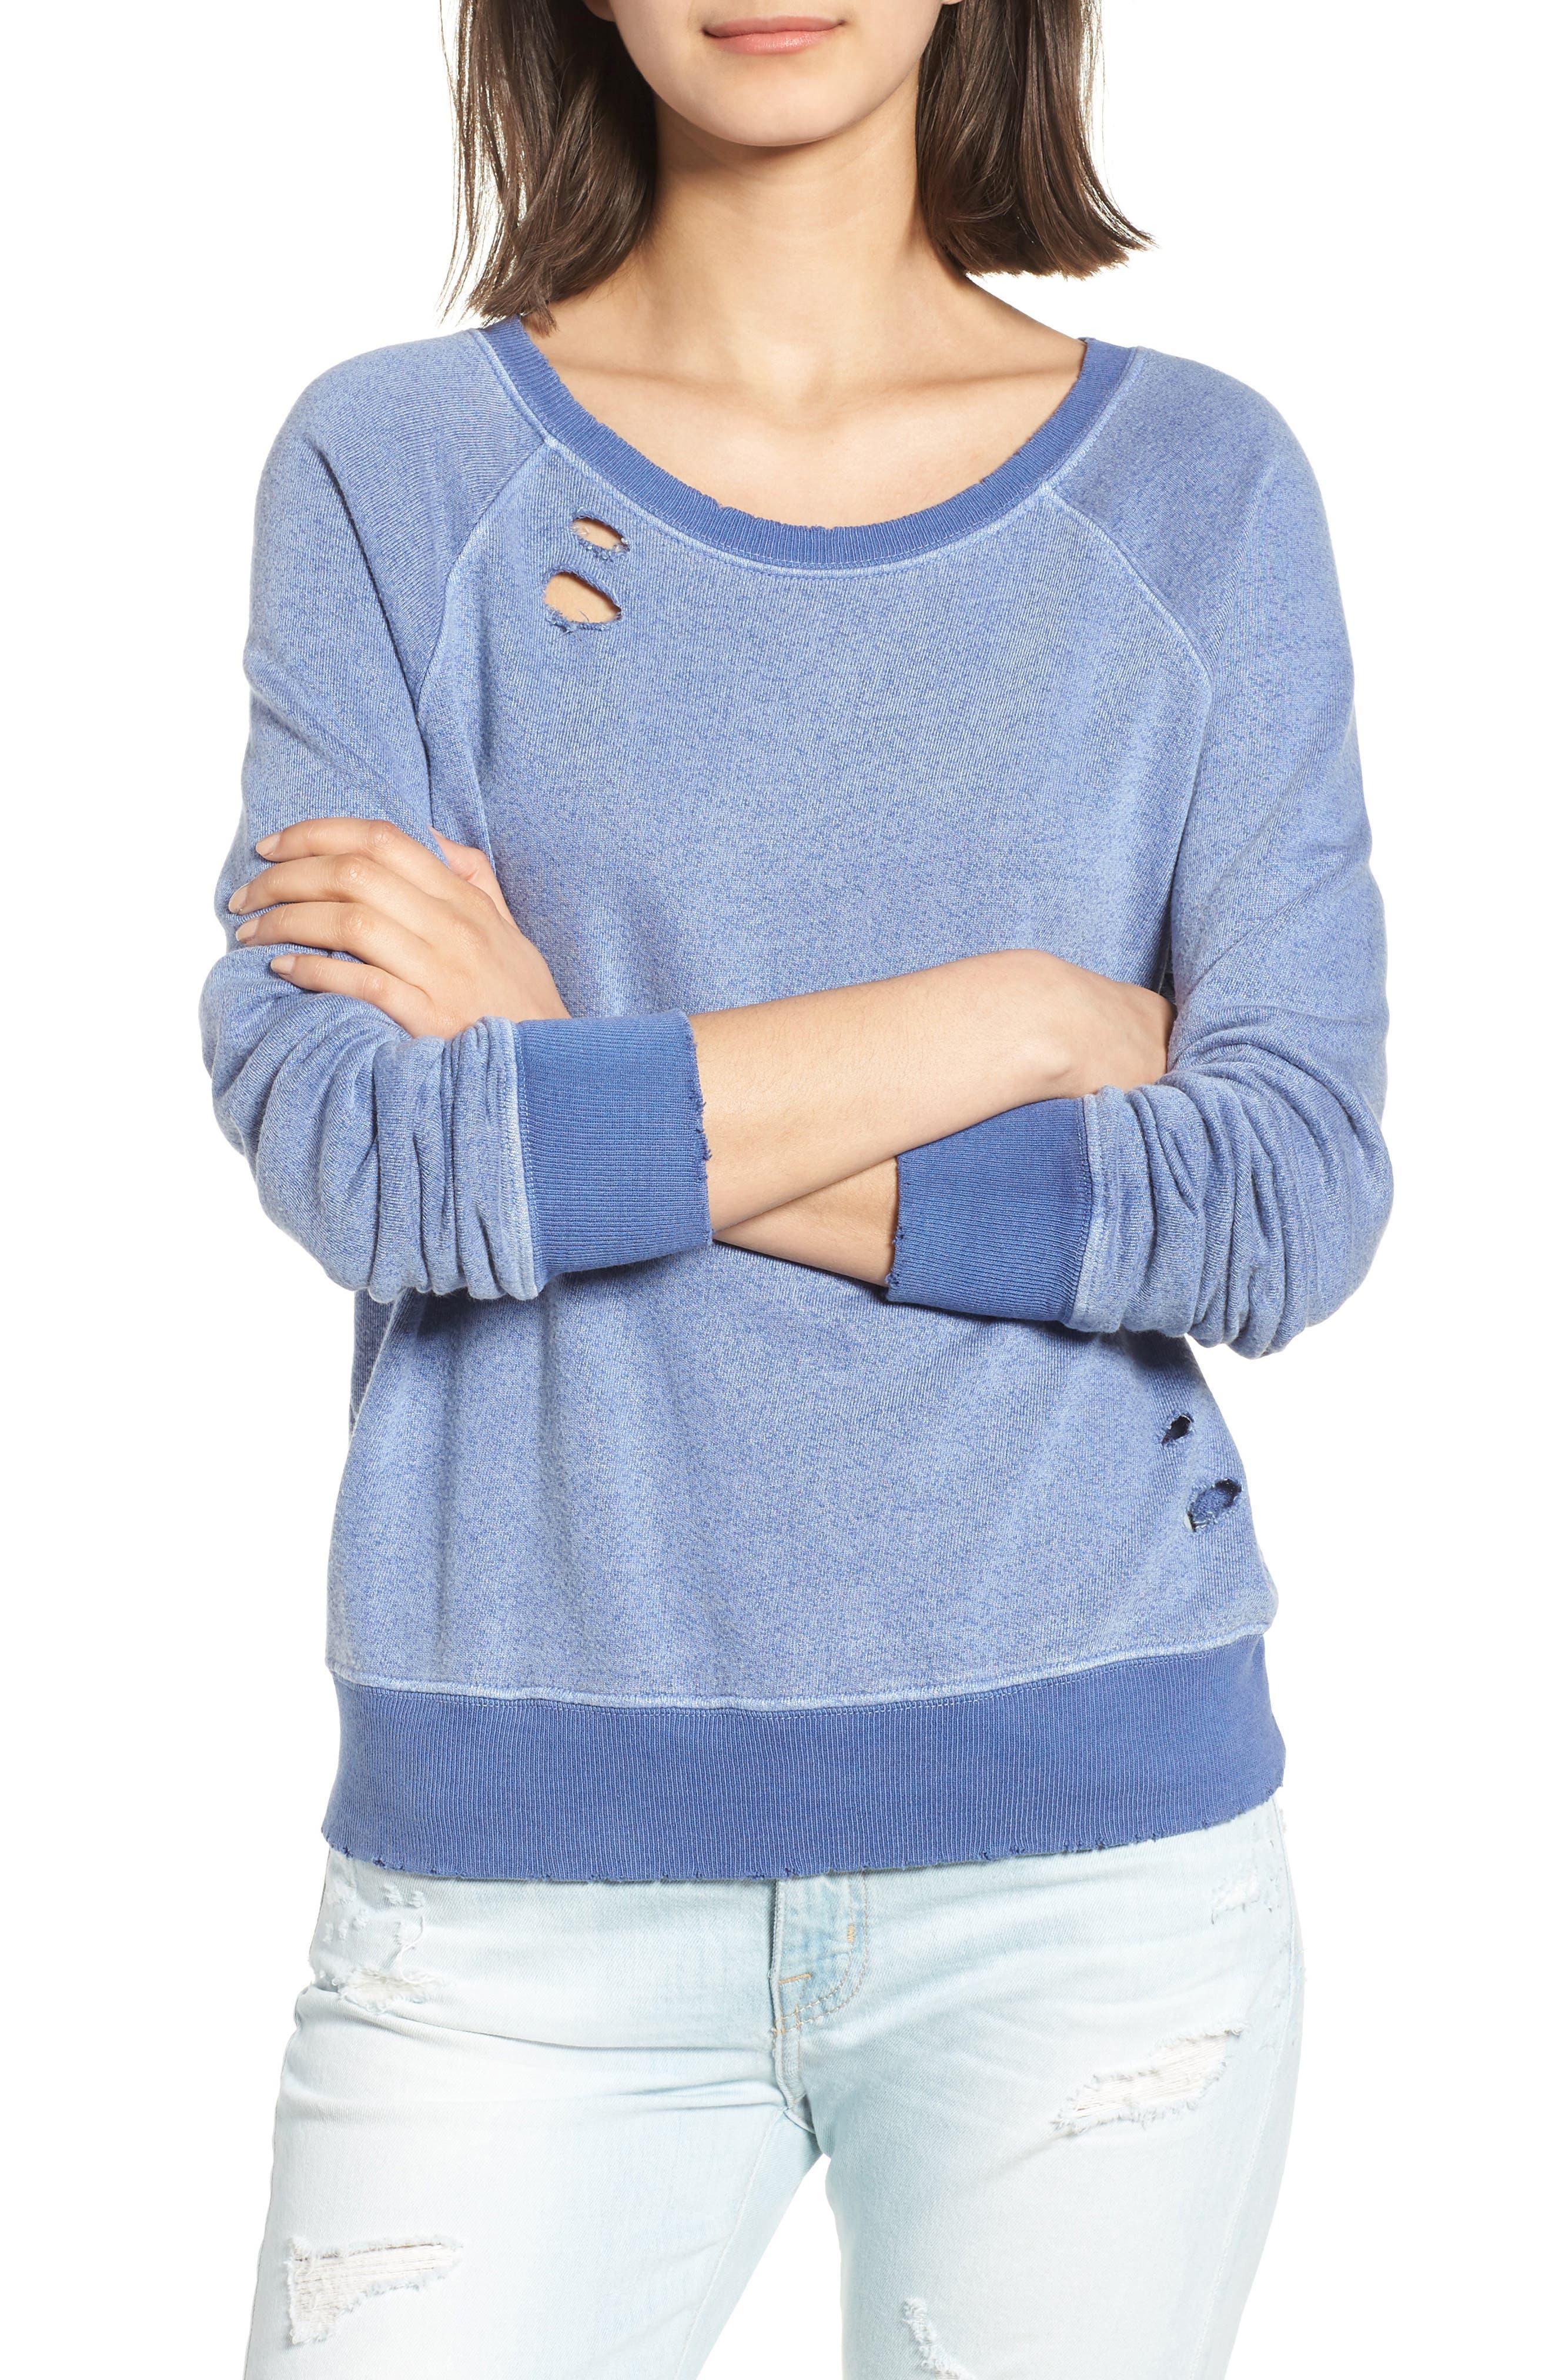 Belize Deconstructed Sweatshirt,                             Main thumbnail 1, color,                             COBALT